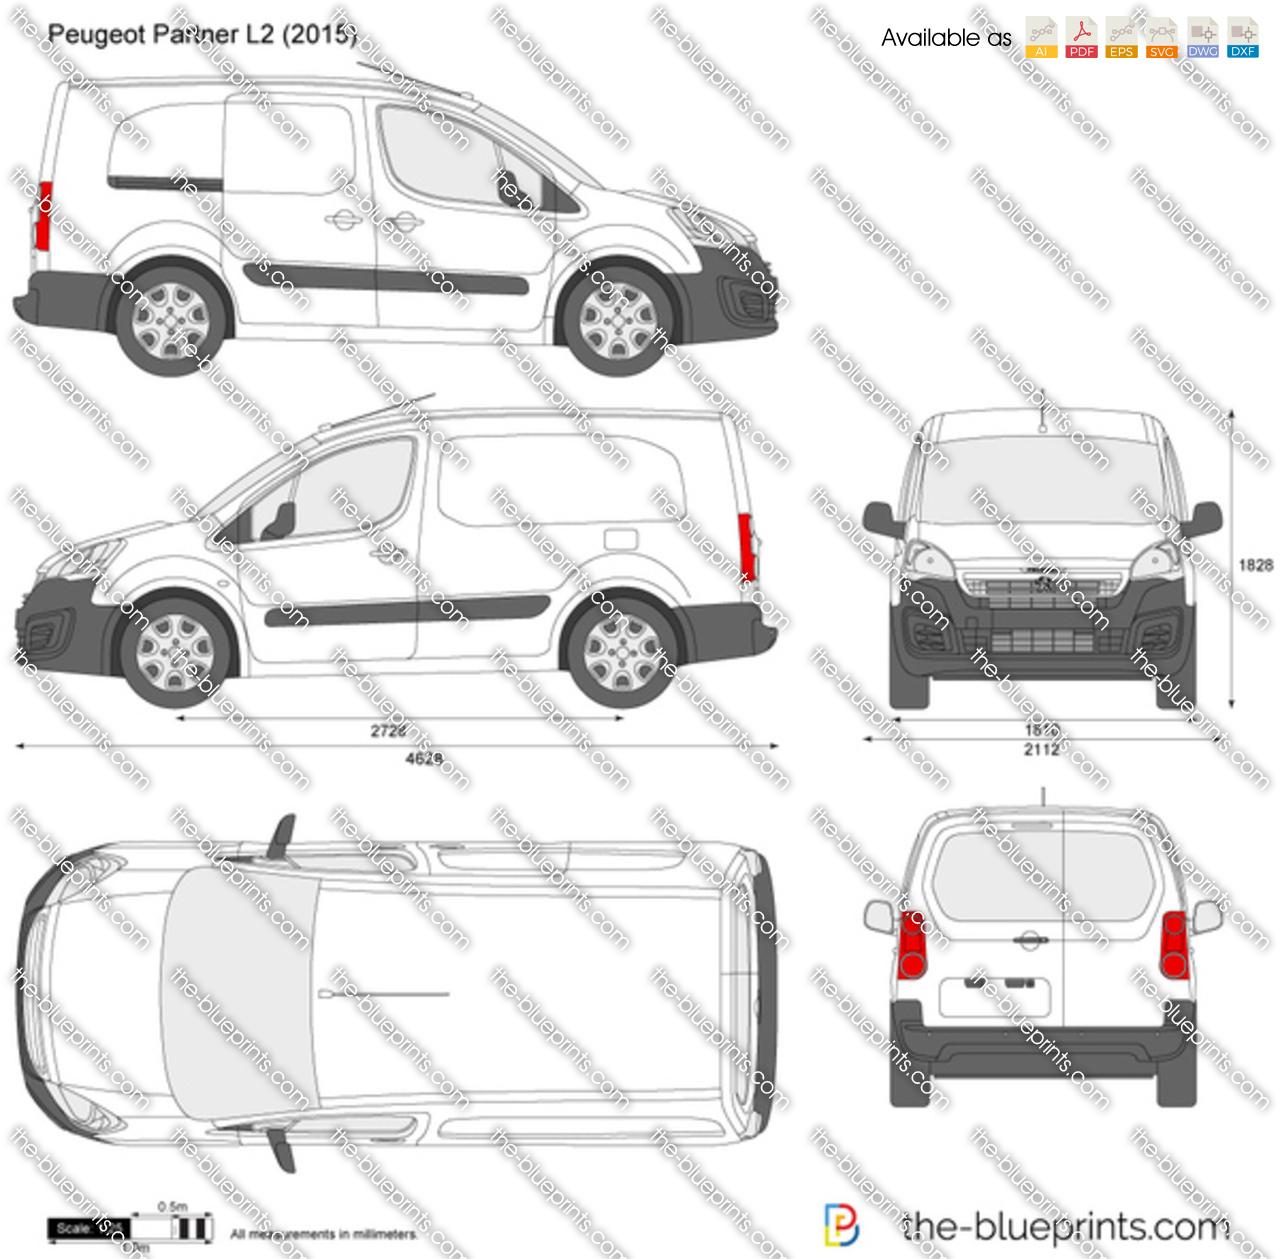 Peugeot Partner L2 2018